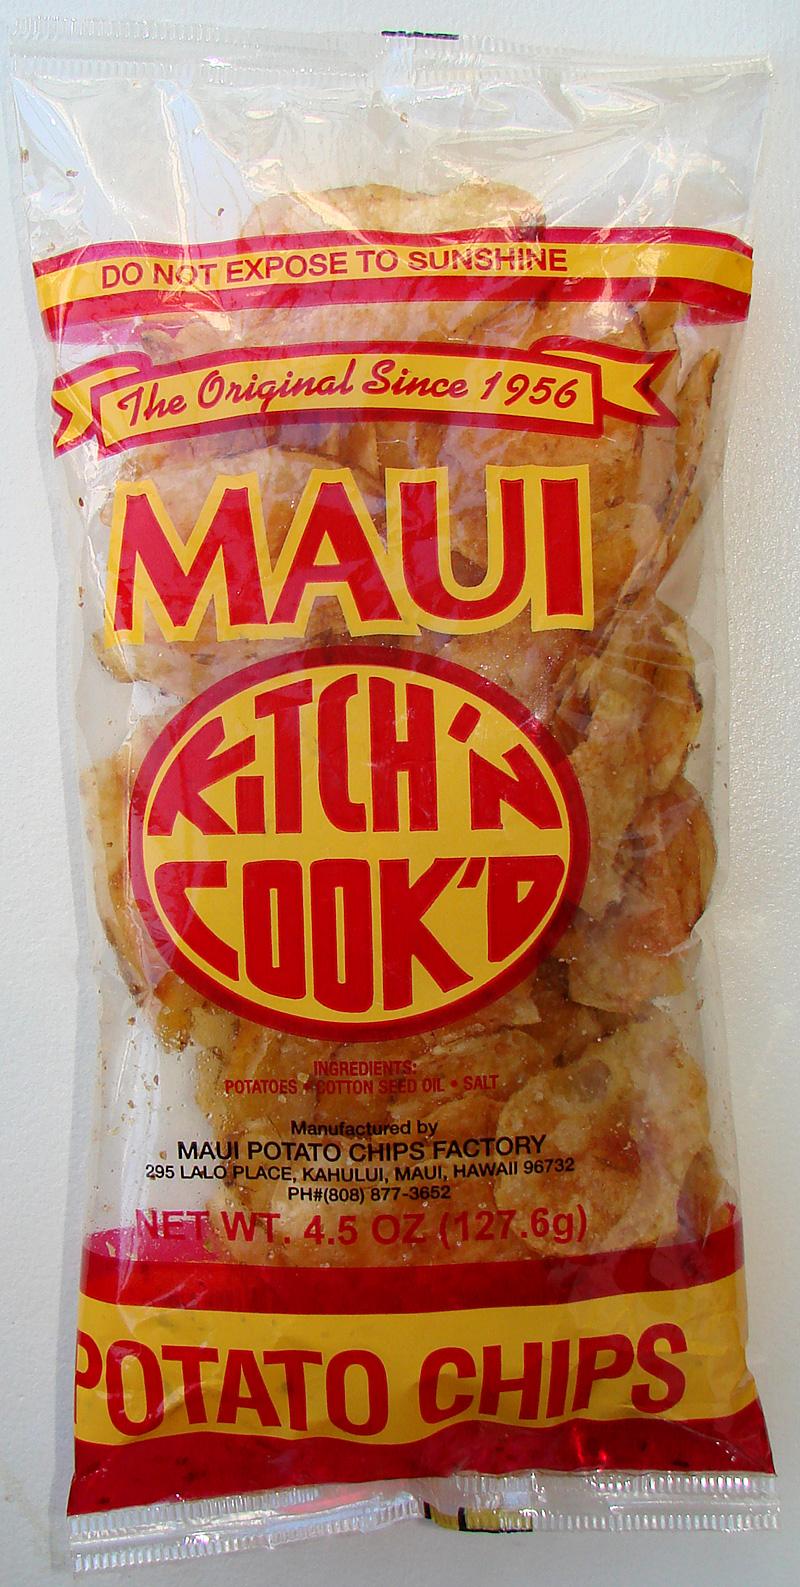 kitch'n cook'd maui potato chips – tasty island